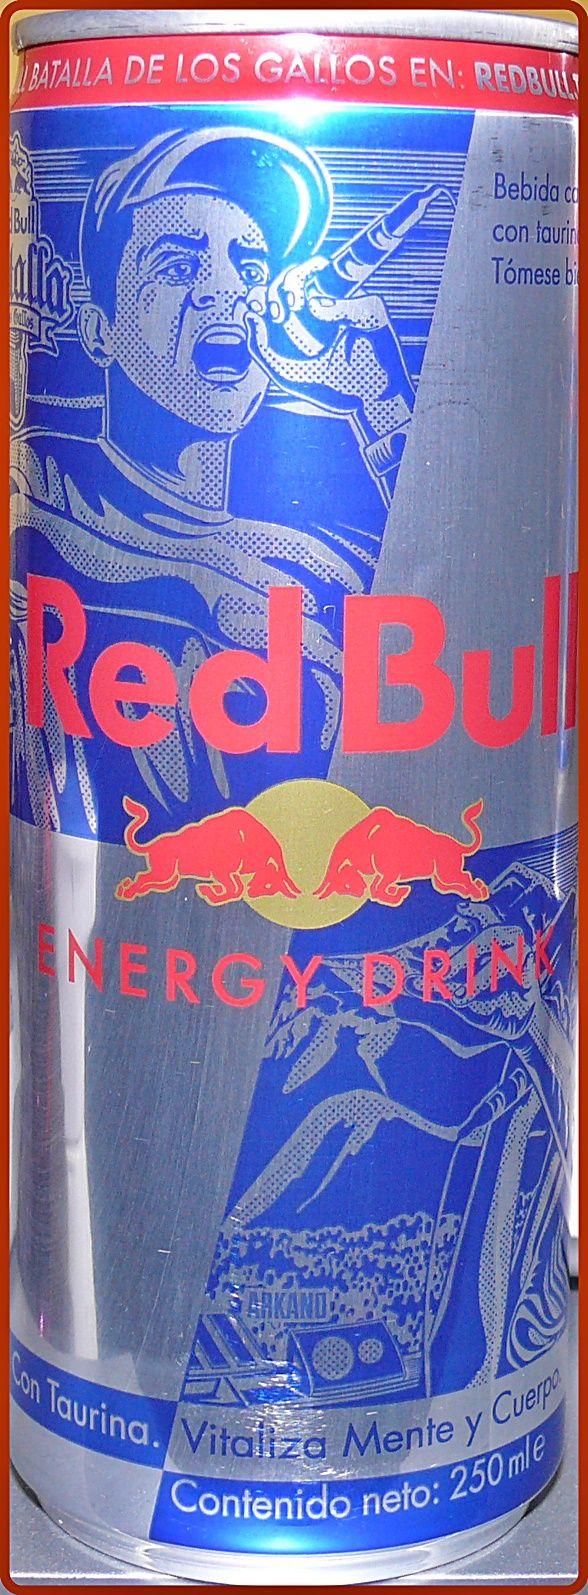 250ml Red Bull Batalla Del Los Gallos Edition from Peru